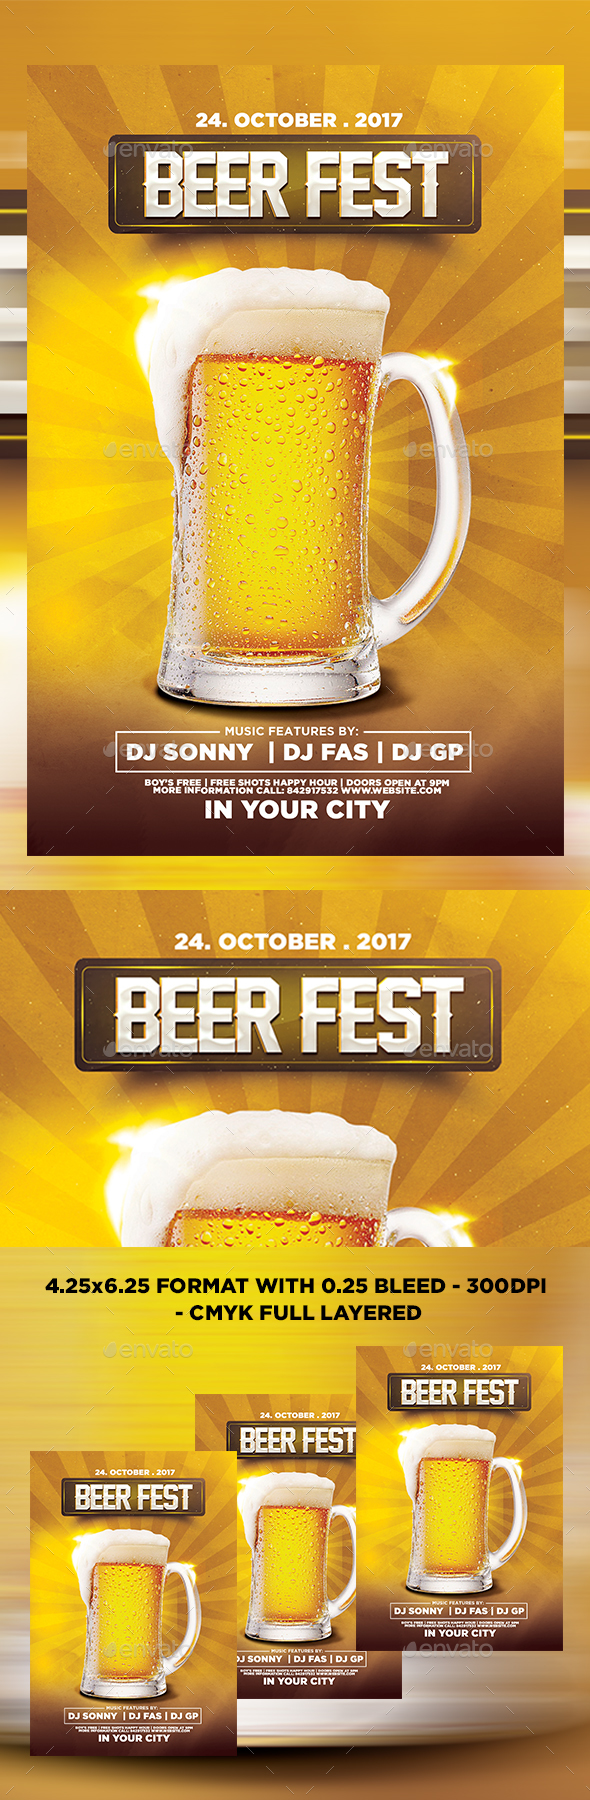 Beer Fest Flyer - Print Templates